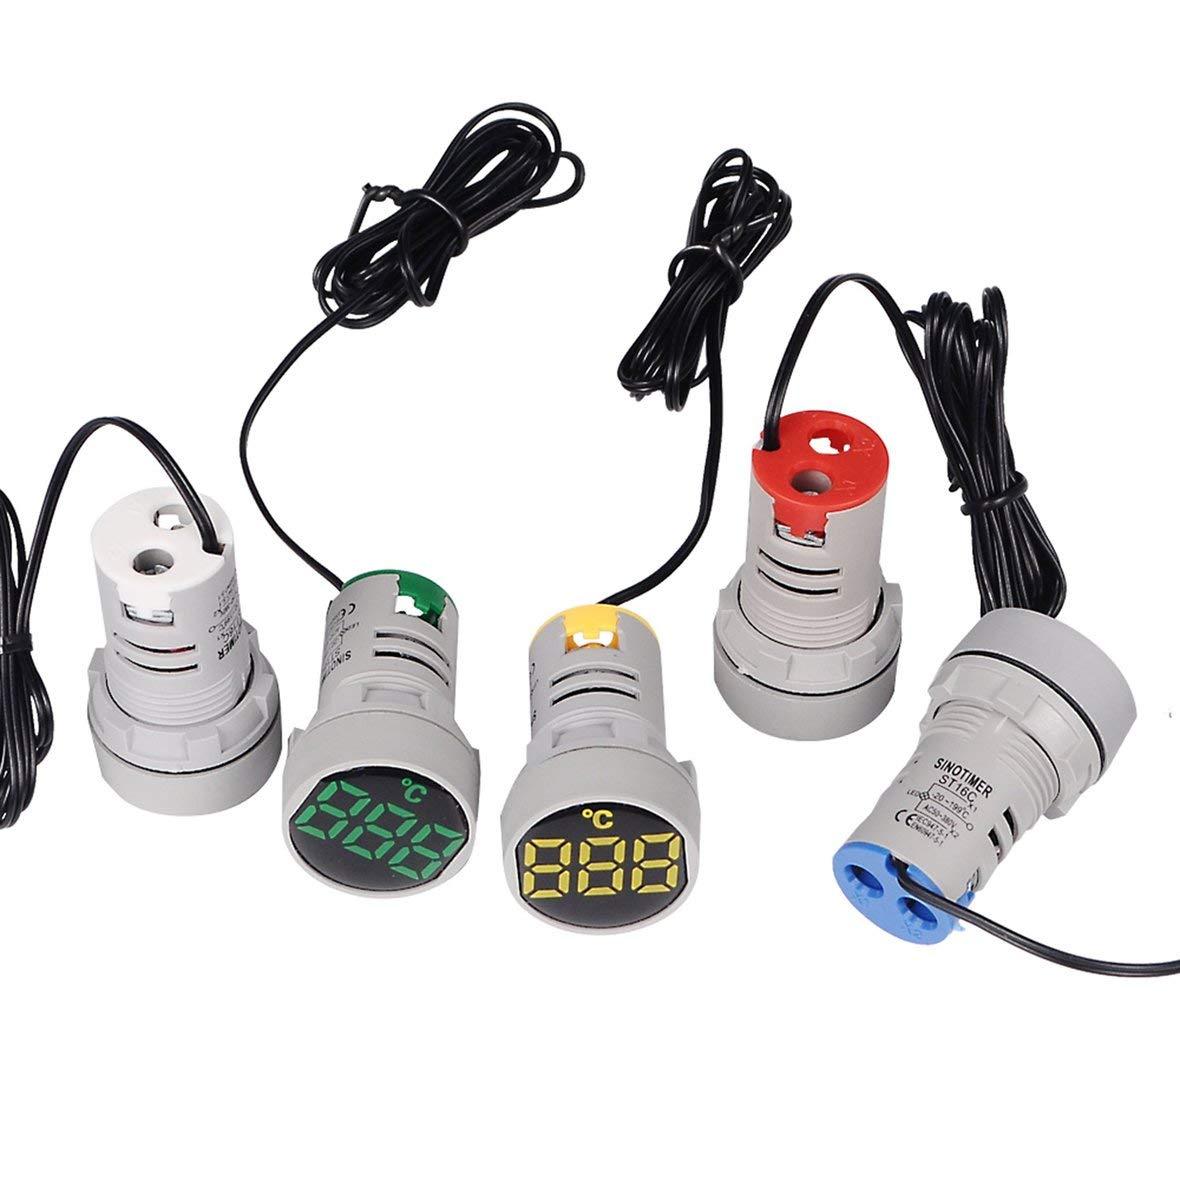 Blanco 20-120 ℃ SINOTIMER ST16C 22mm Ronda LED Pantalla digital Term/ómetro Medidor de temperatura Probador Indicador Luz de se/ñal